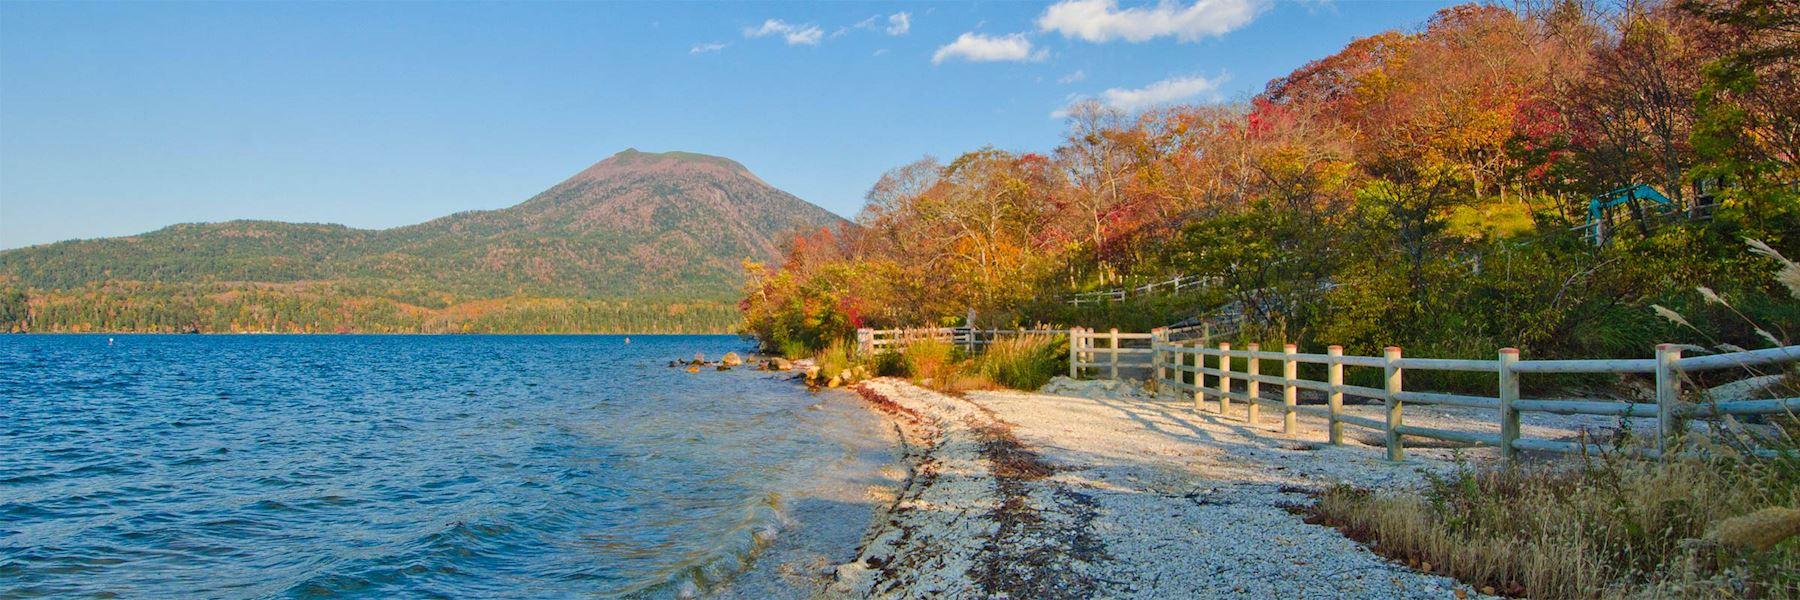 Visit Akan-ko National Park, Japan